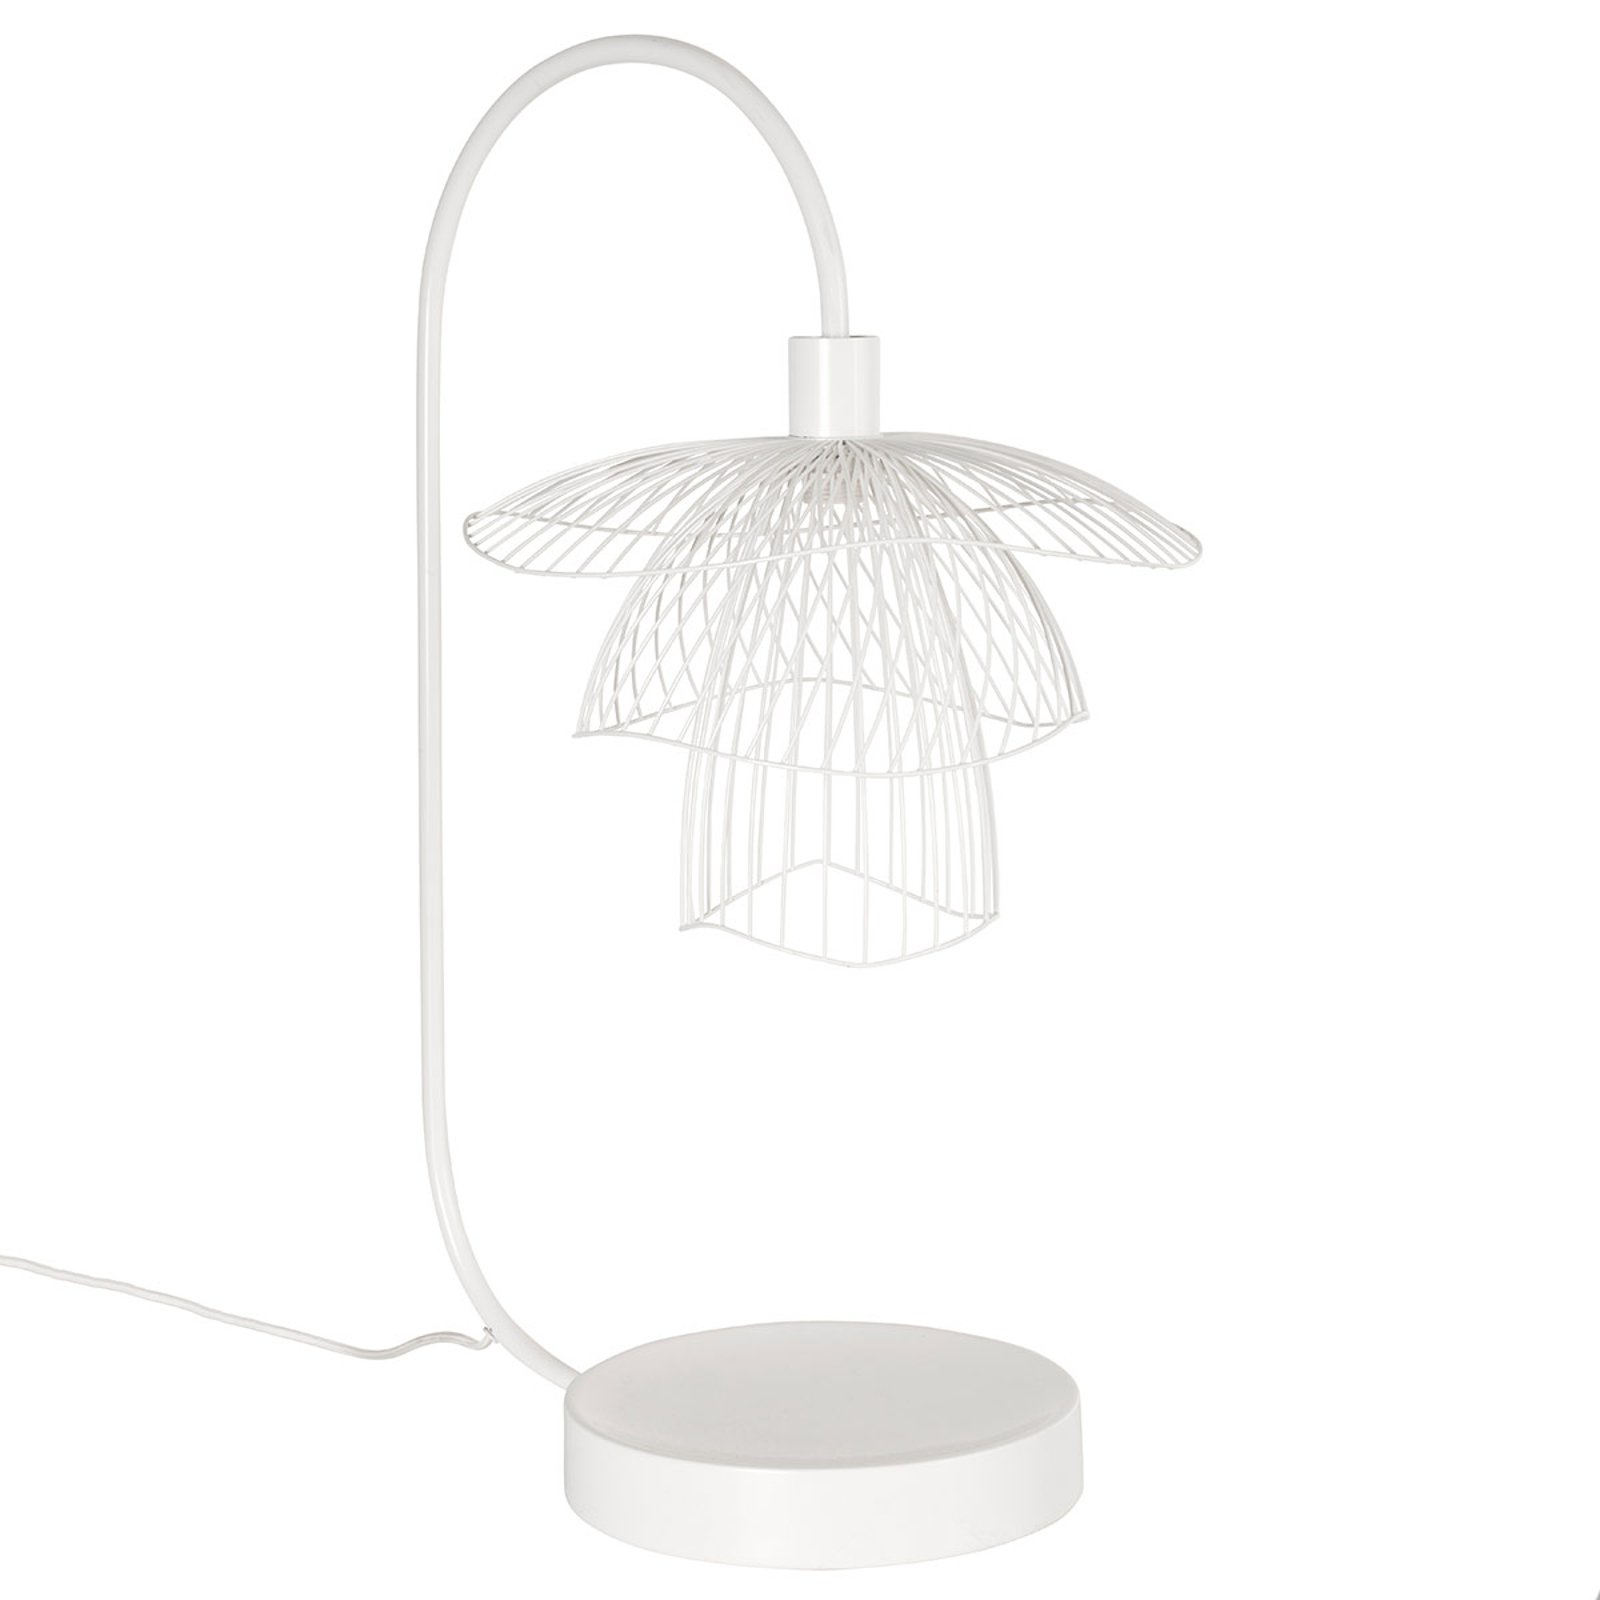 Forestier Papillon XS bordlampe, hvit